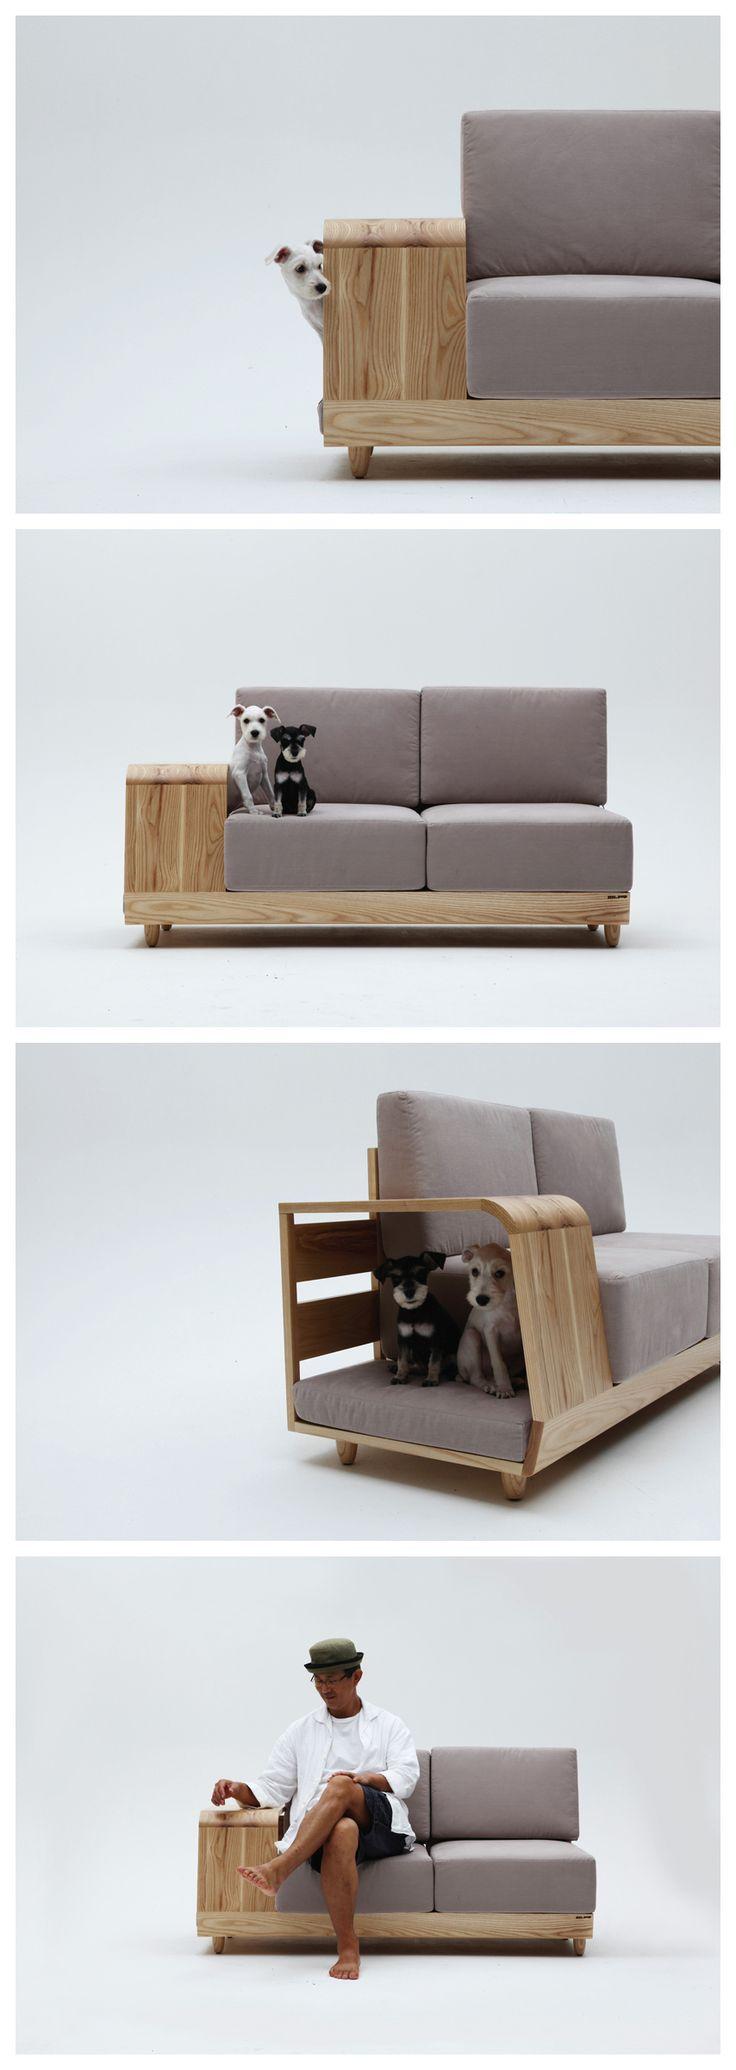 """The Dog House Sofa"" by Korean designer Seungji Mun"